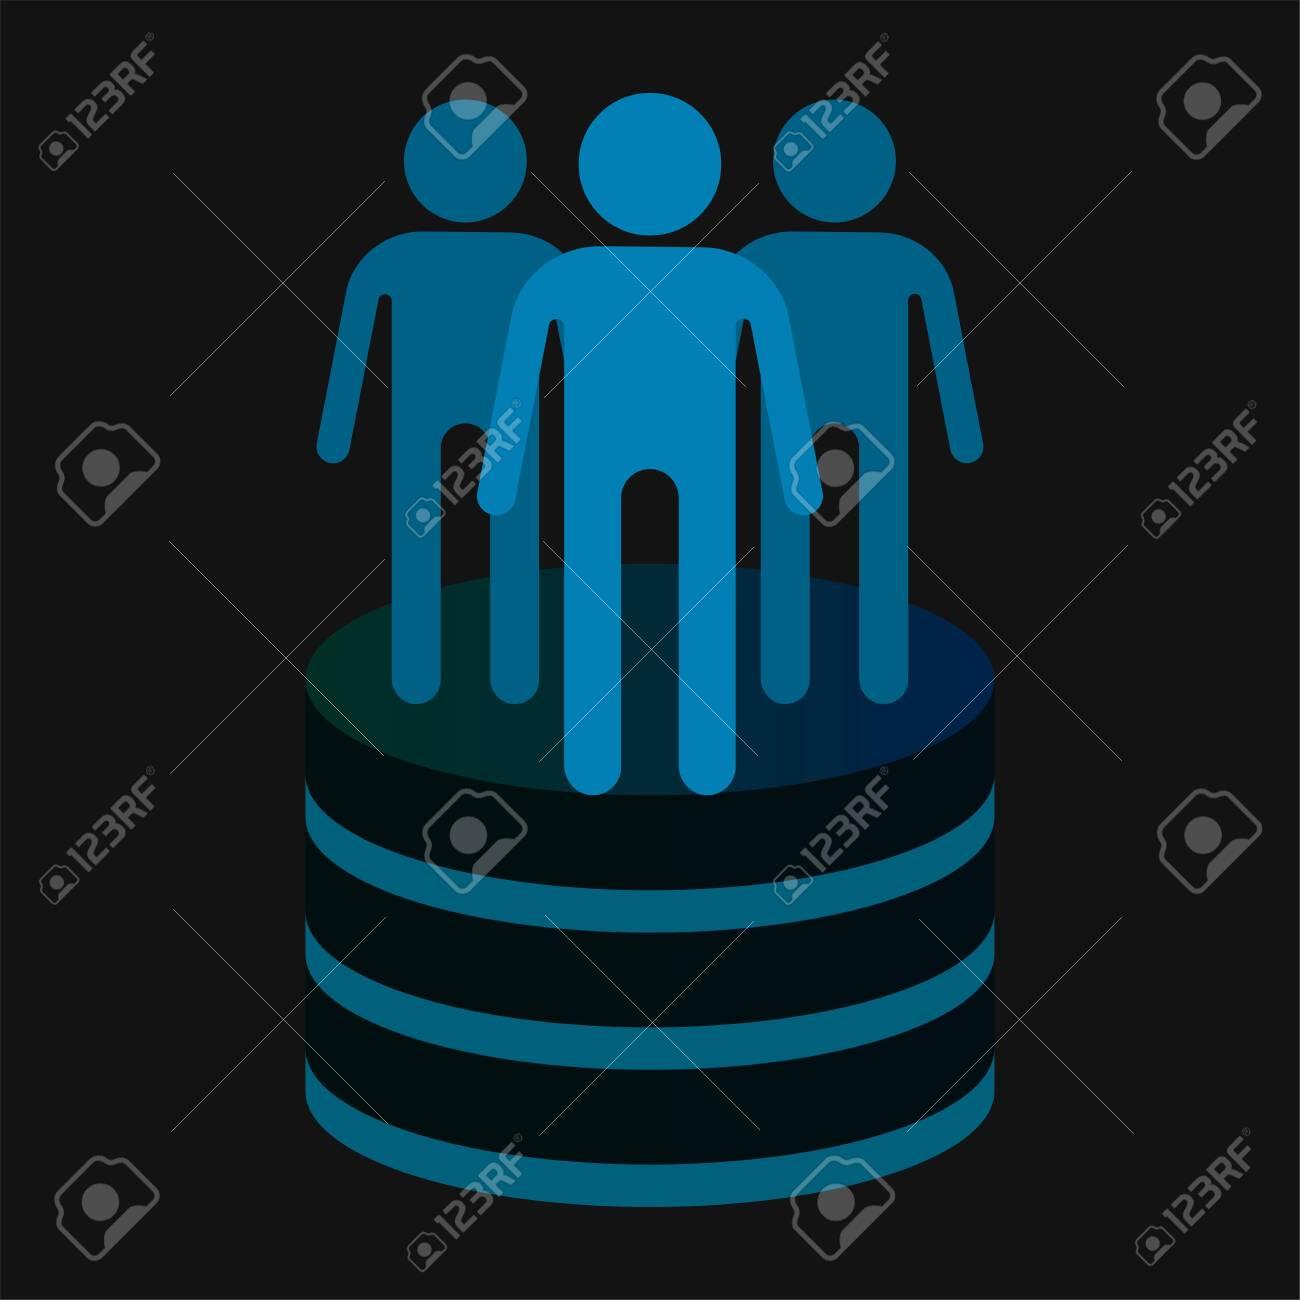 Data warehouse icon logo design. Vector illustration - 128904253